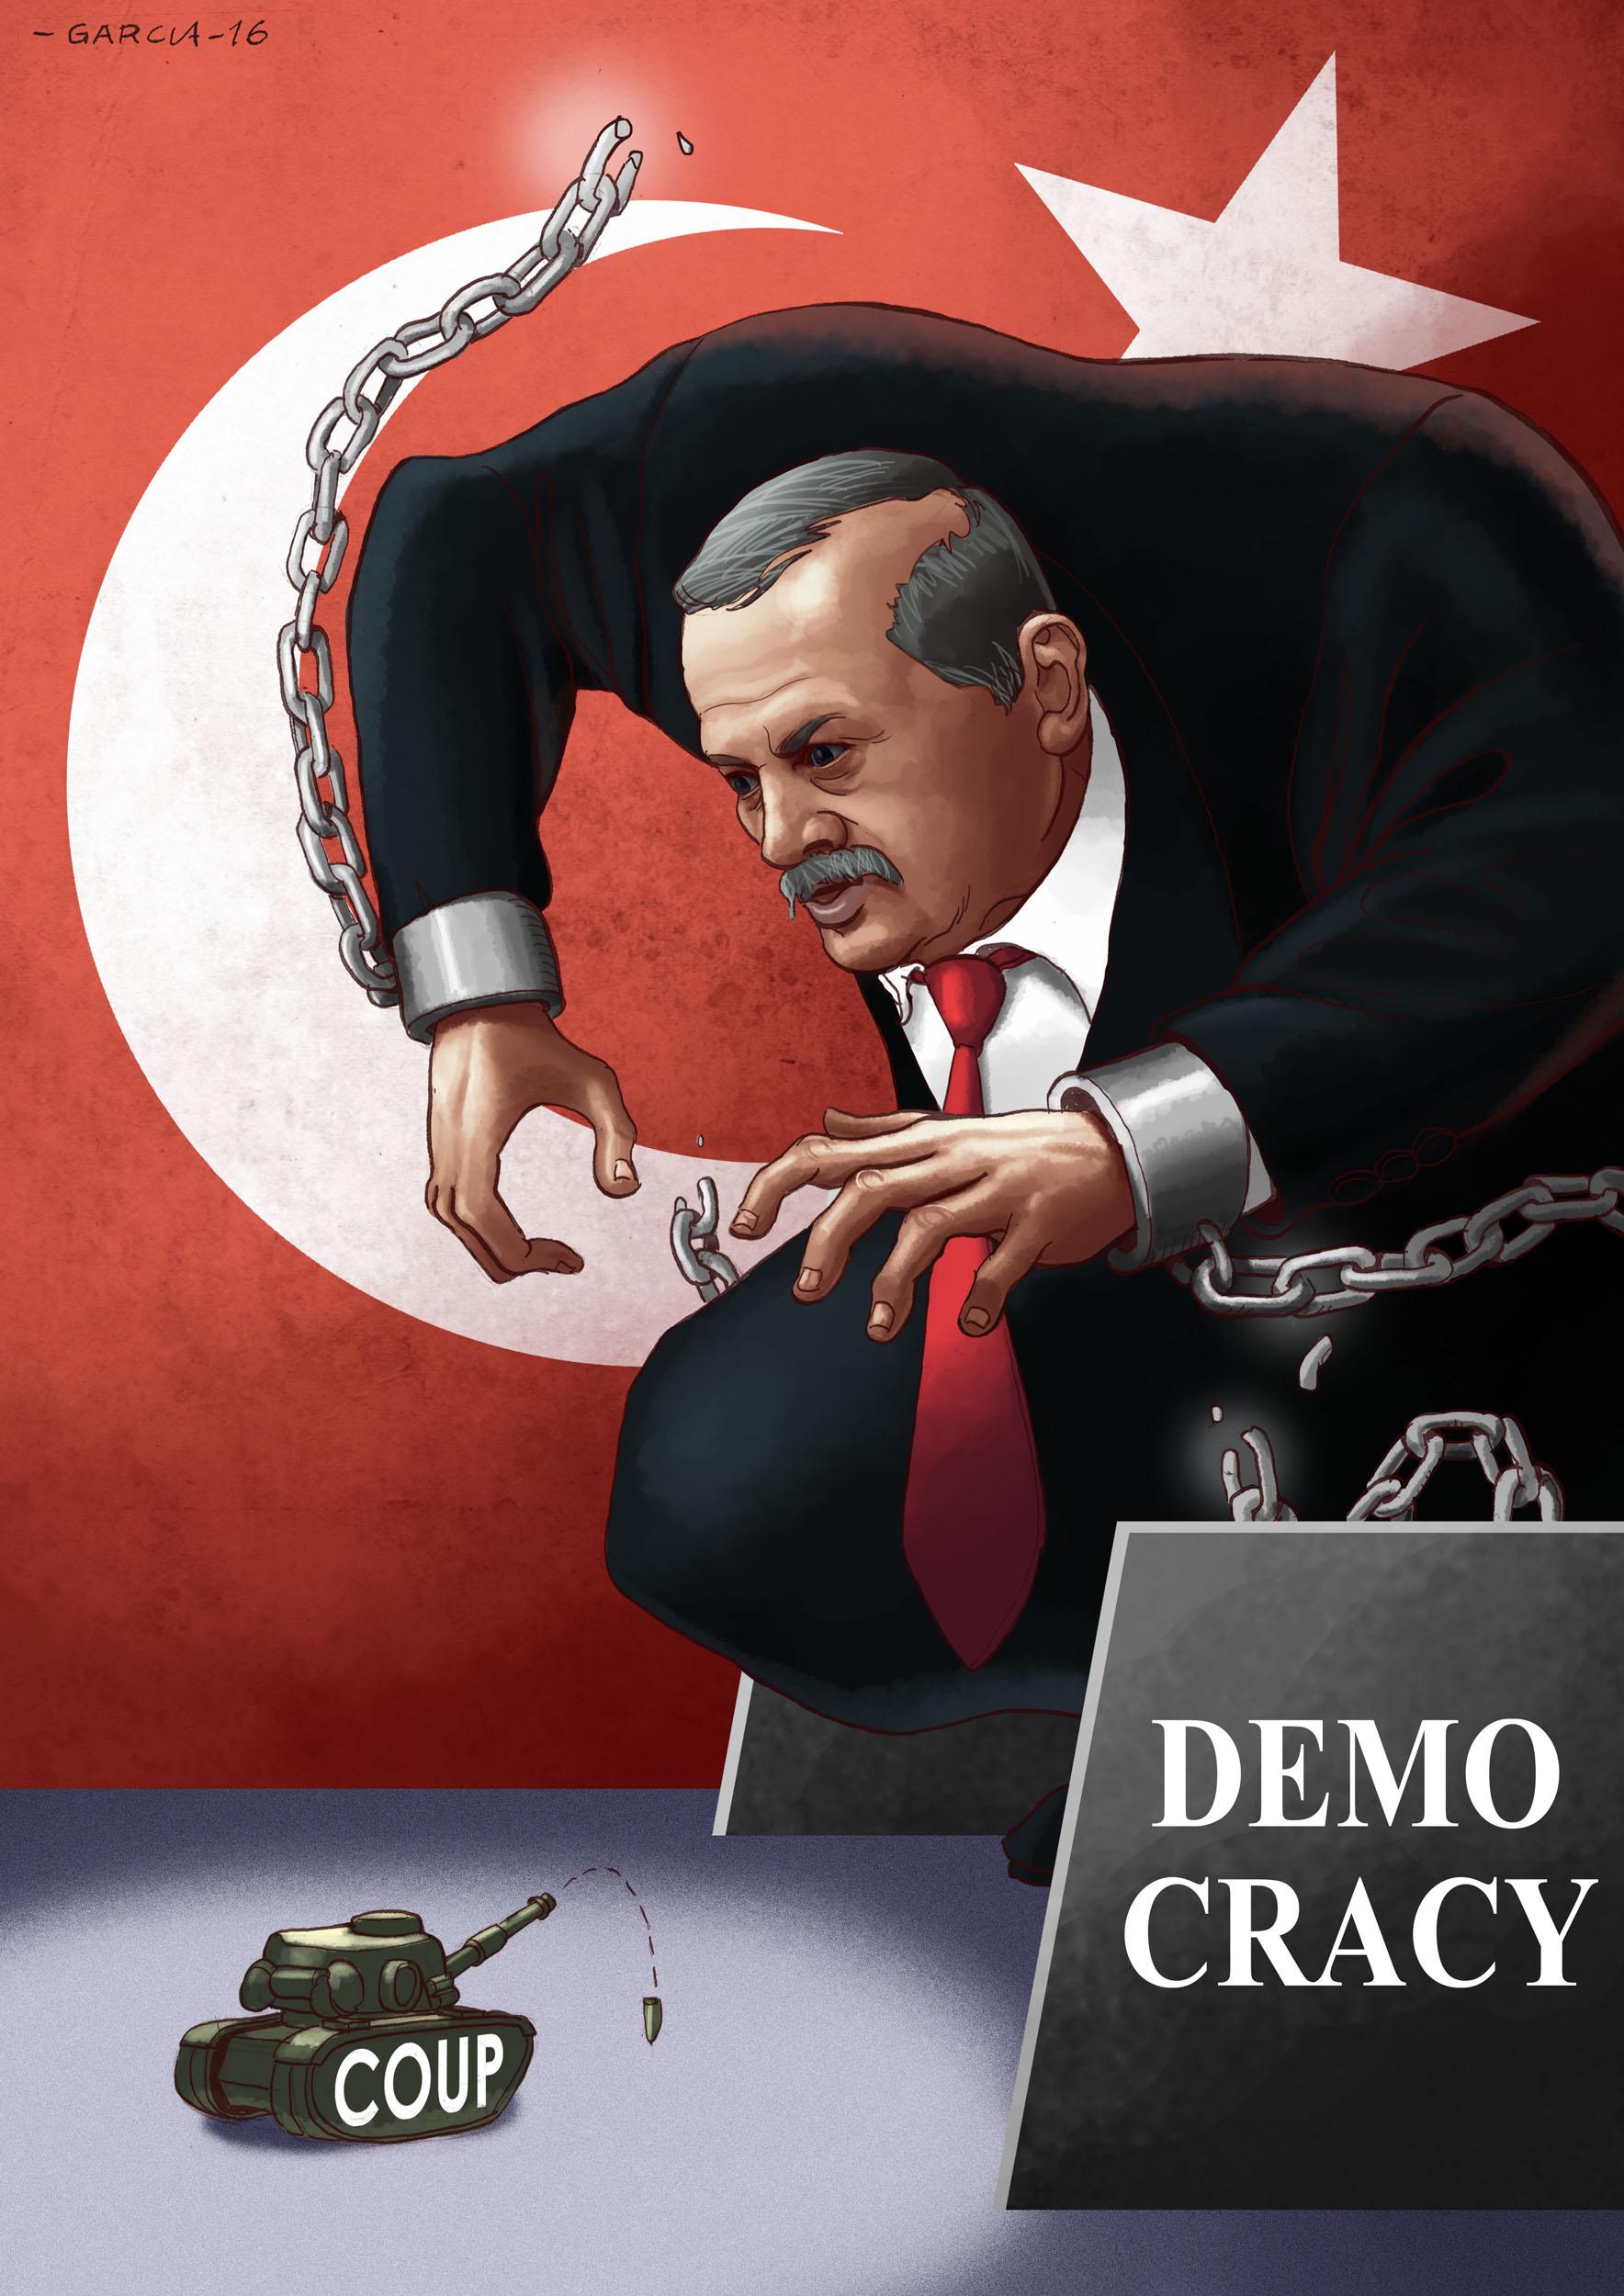 Daniel Garcia Art Cartoon Erdogan Turkey Coup Revolution Turkiye hukumet darbesi purge 2